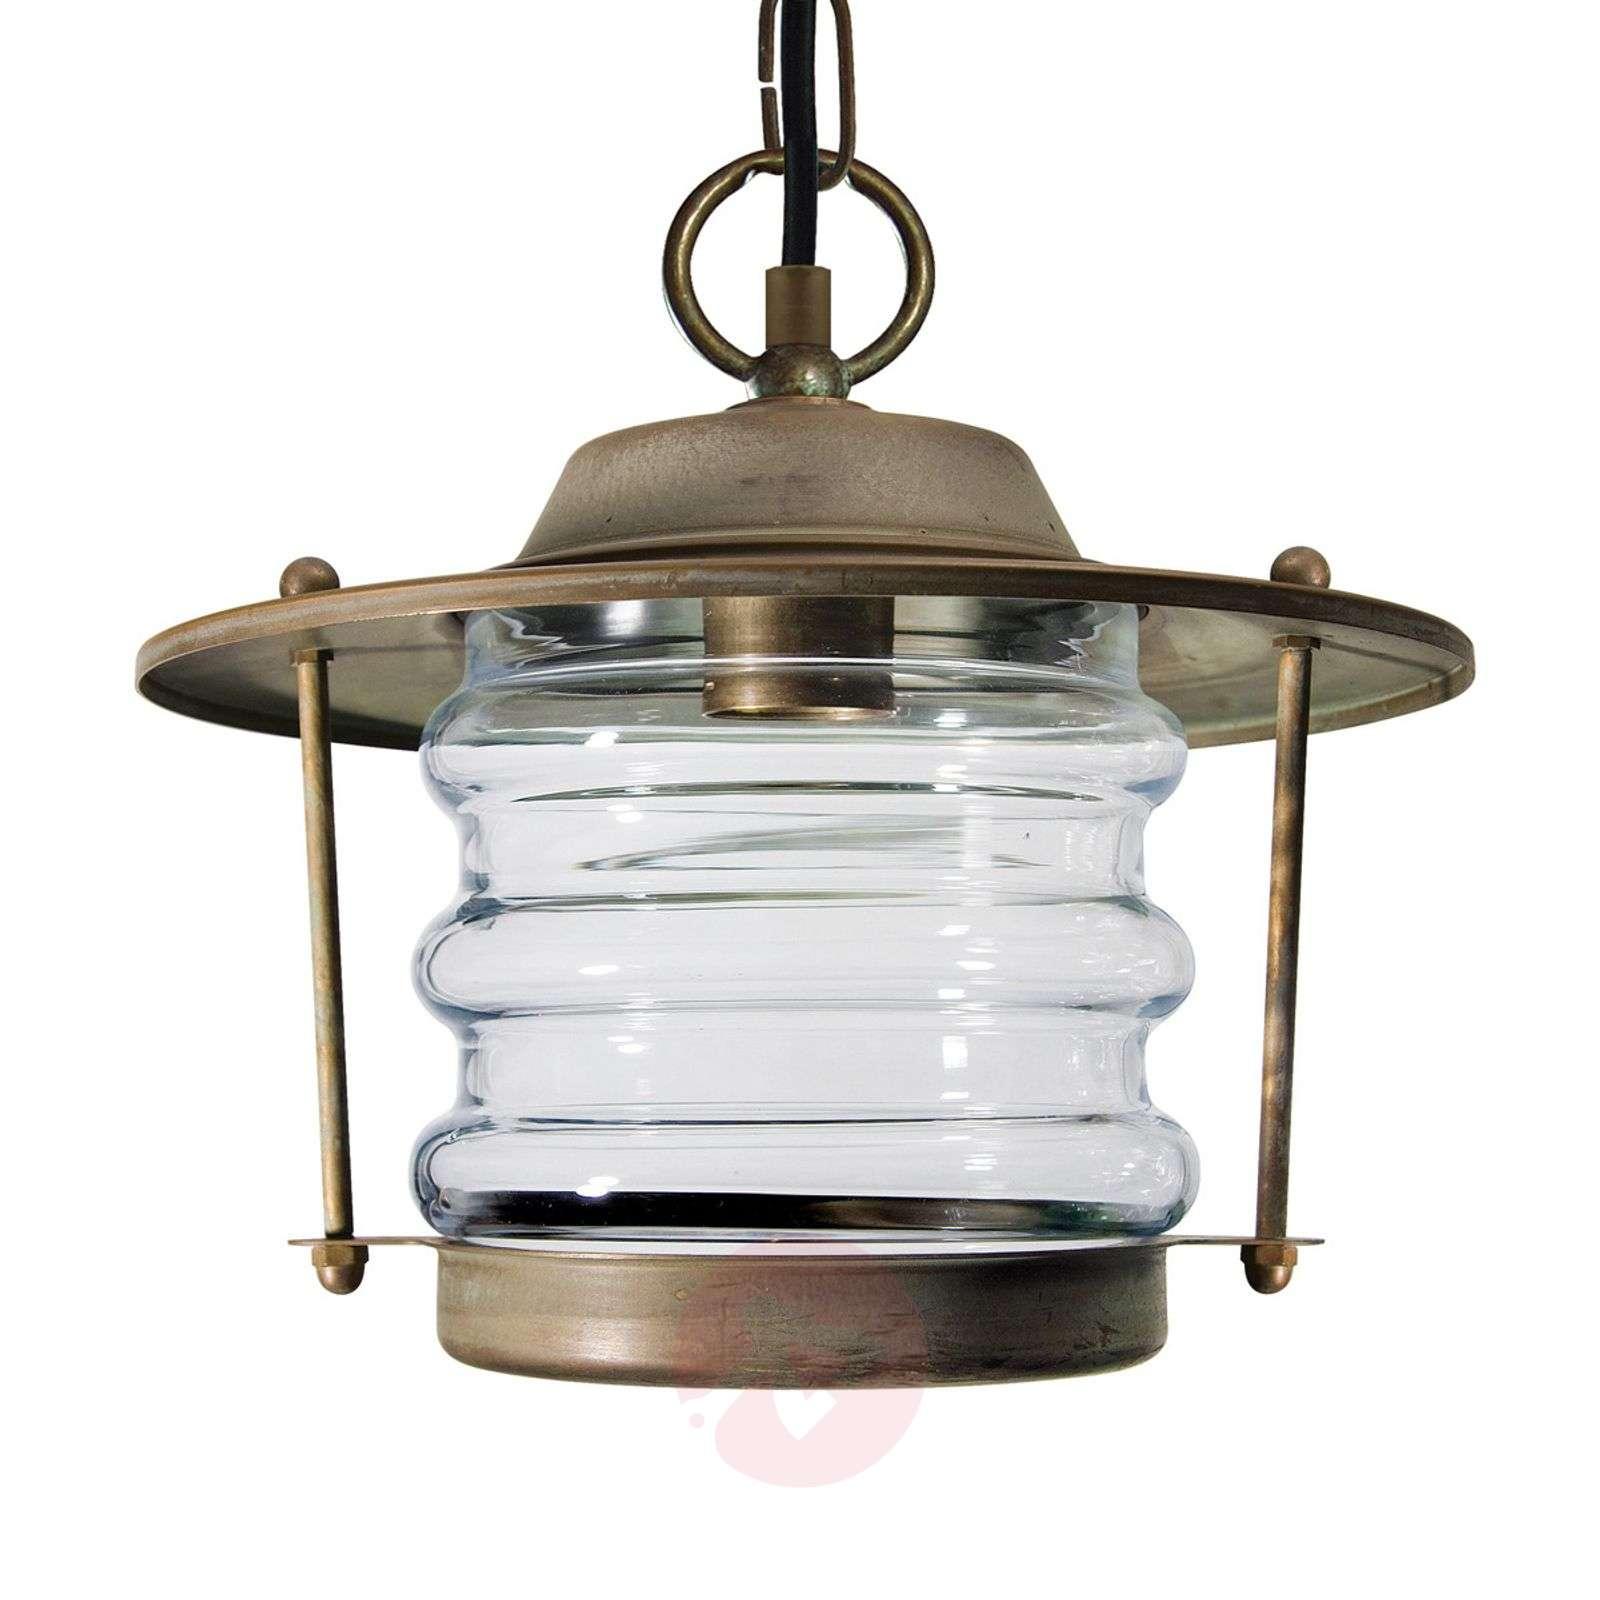 Outdoor hanging light Adessora seawater-res.-6515257-01